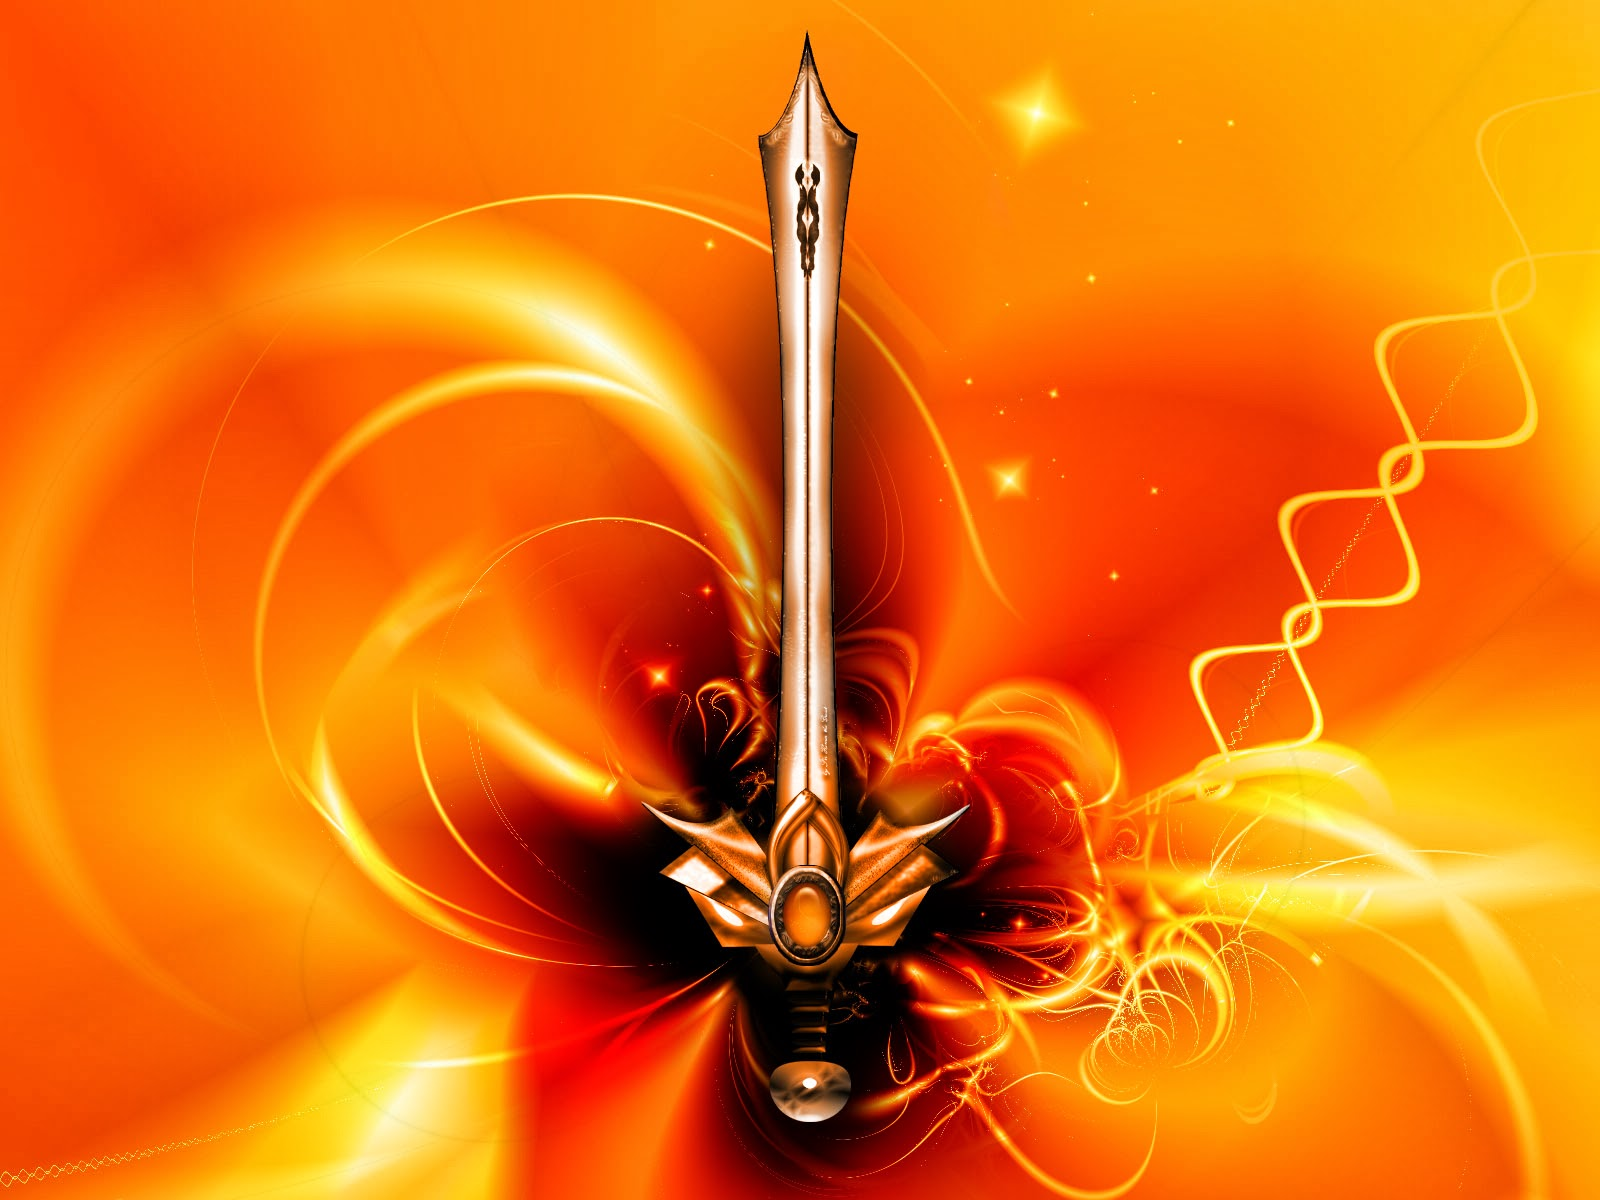 The Start Of Armageddon A Sword